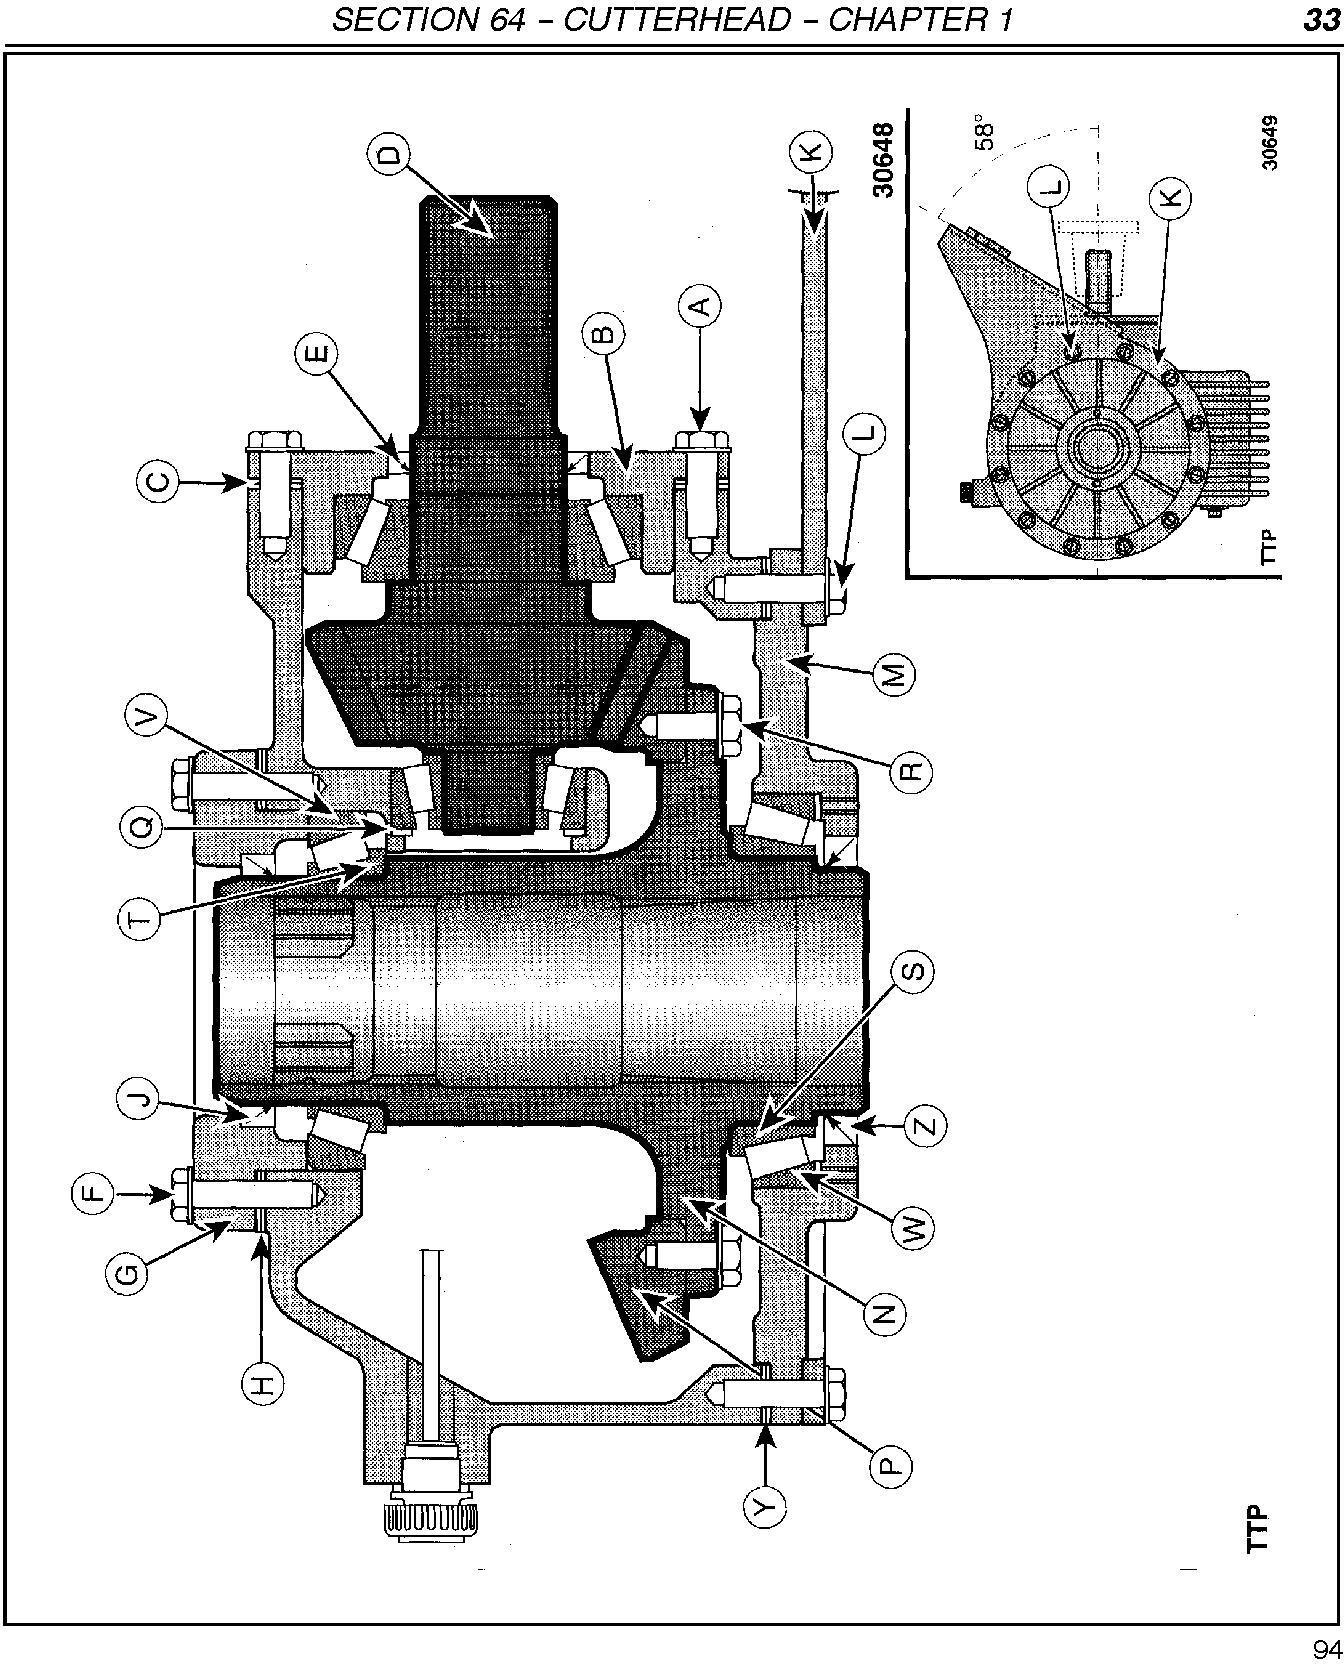 New Holland FX25, FX28, FX38, FX45, FX48, FX58 Forage Harvester Complete Service Manual - 2